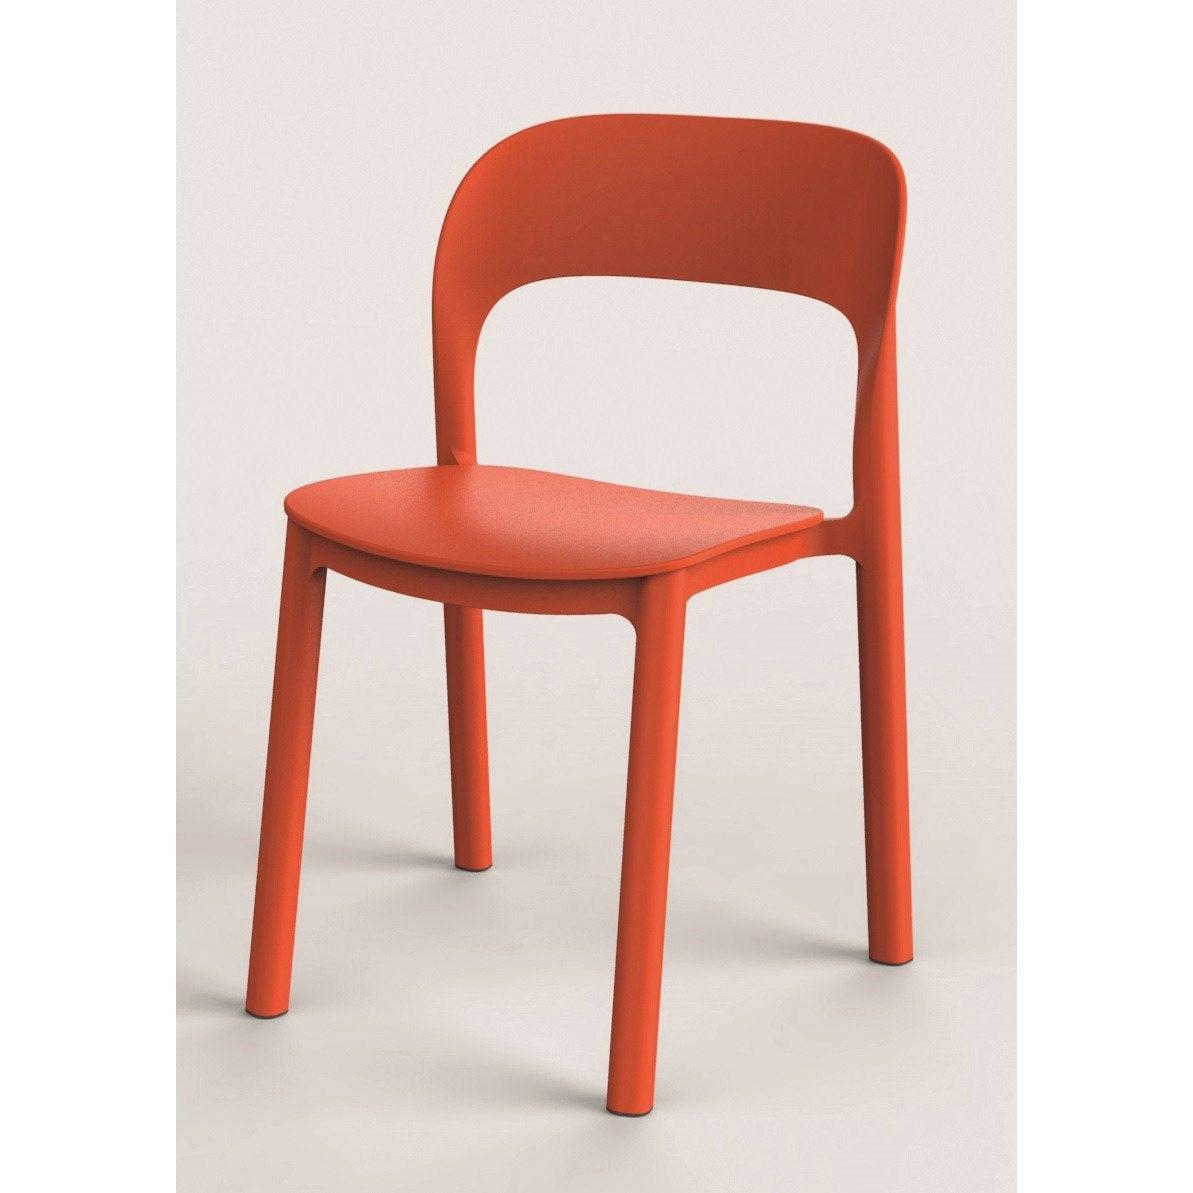 Chaise de jardin en résine injectée Ona orange | Leroy Merlin